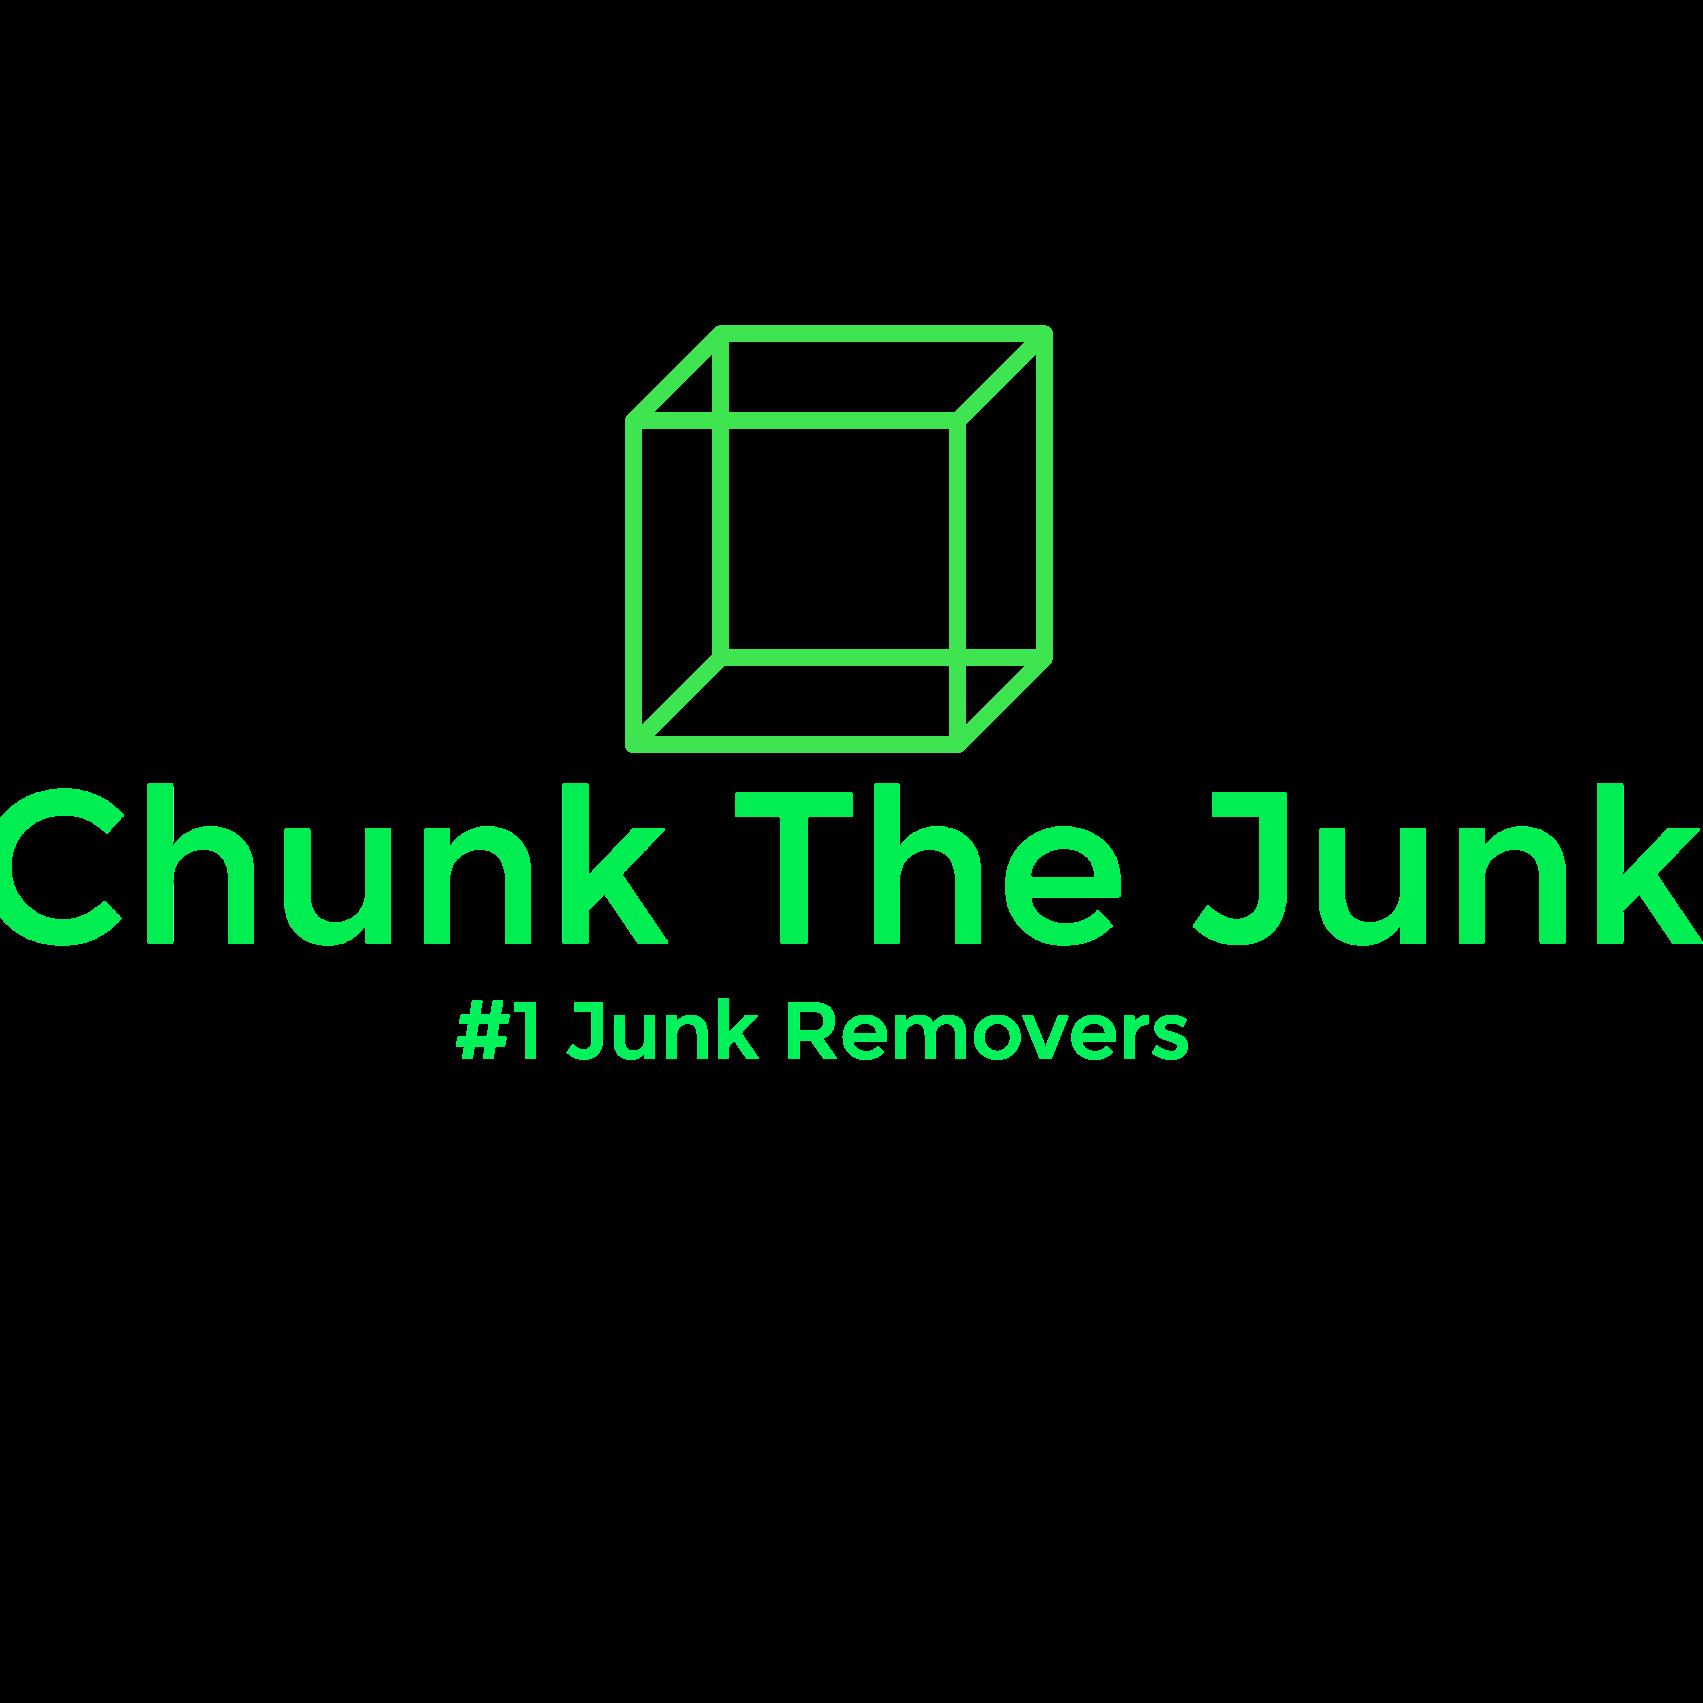 Chunk The Junk